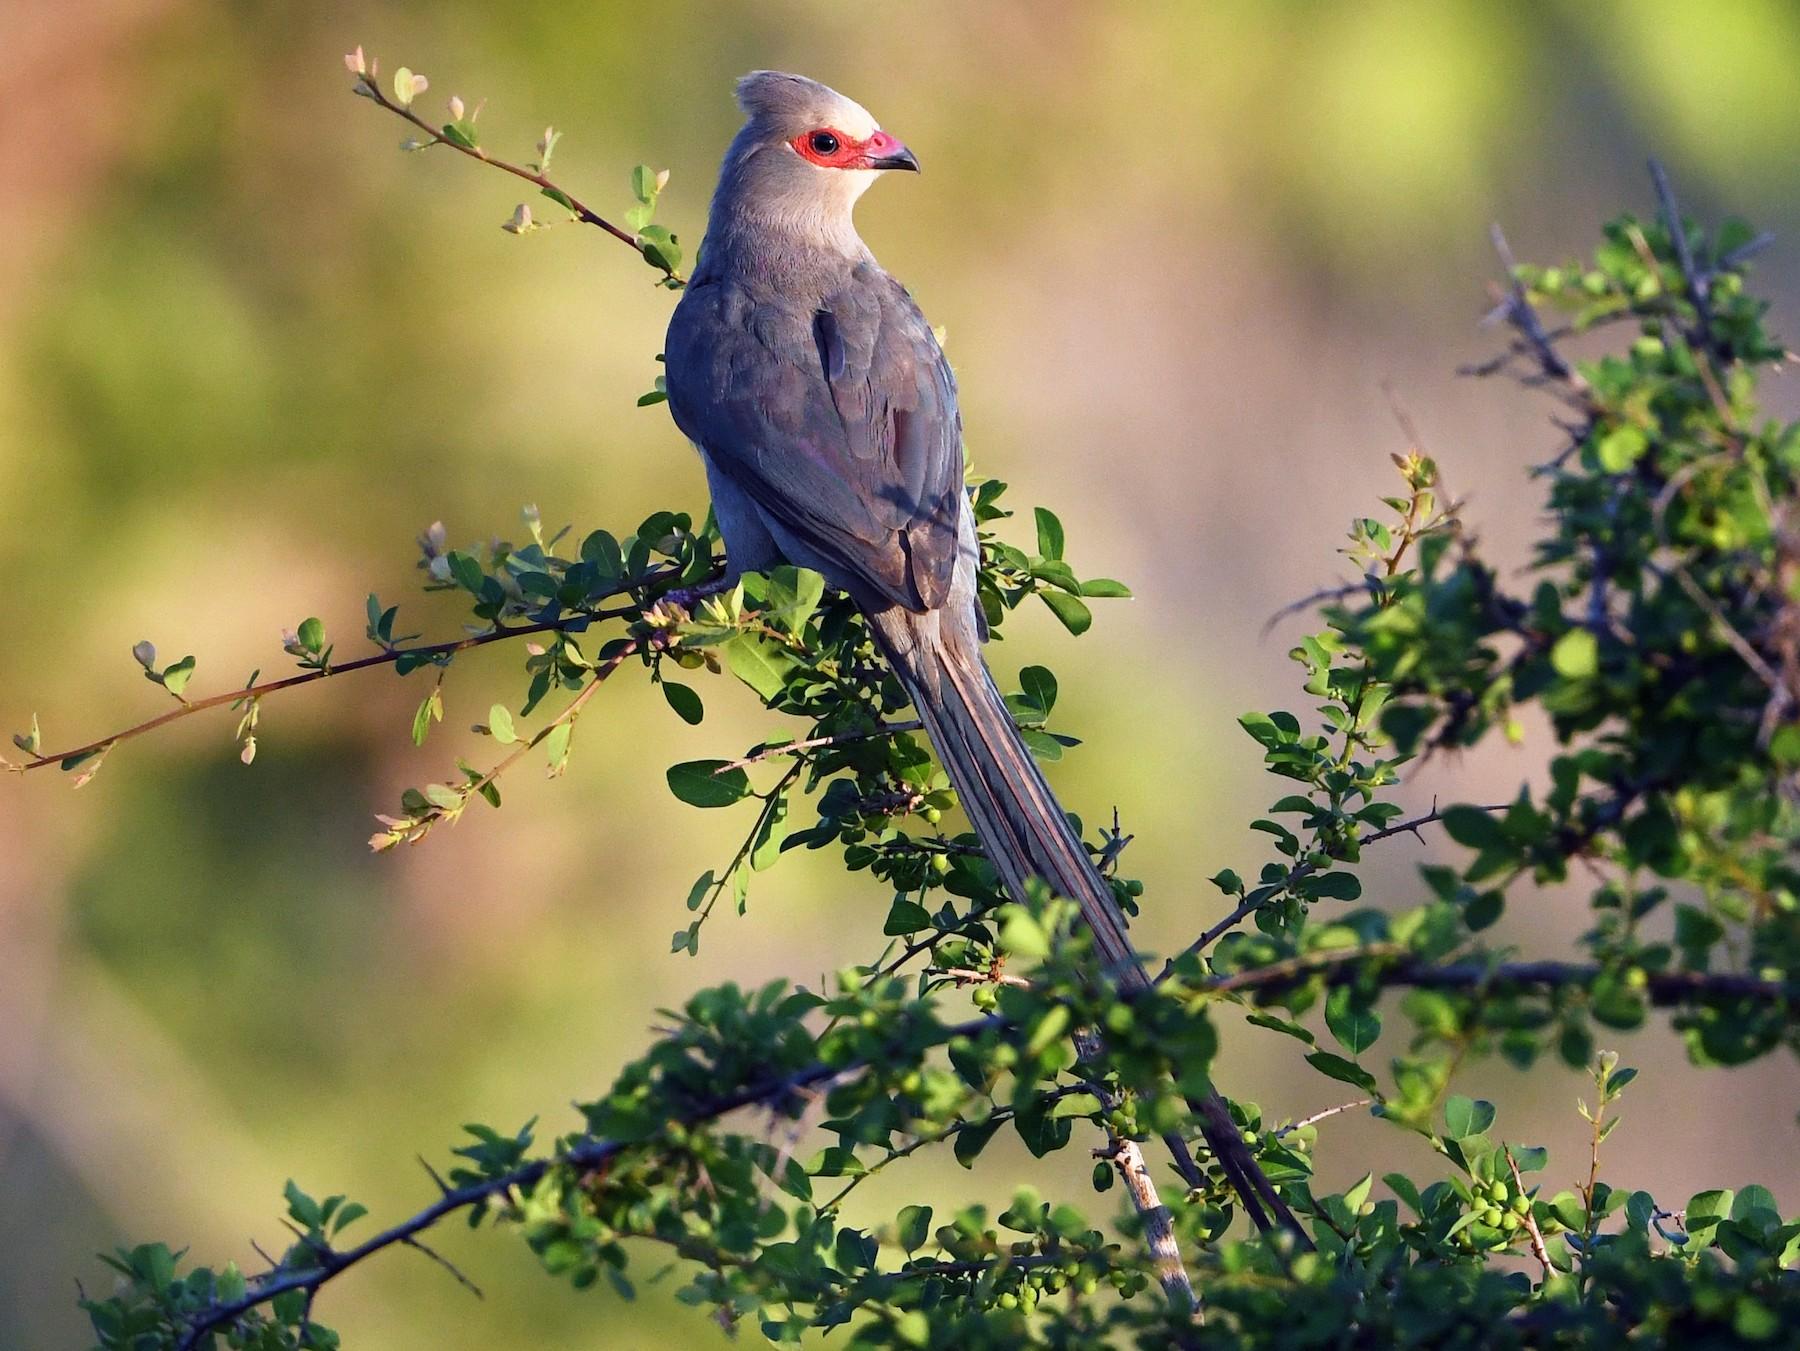 Red-faced Mousebird - Maryse Neukomm